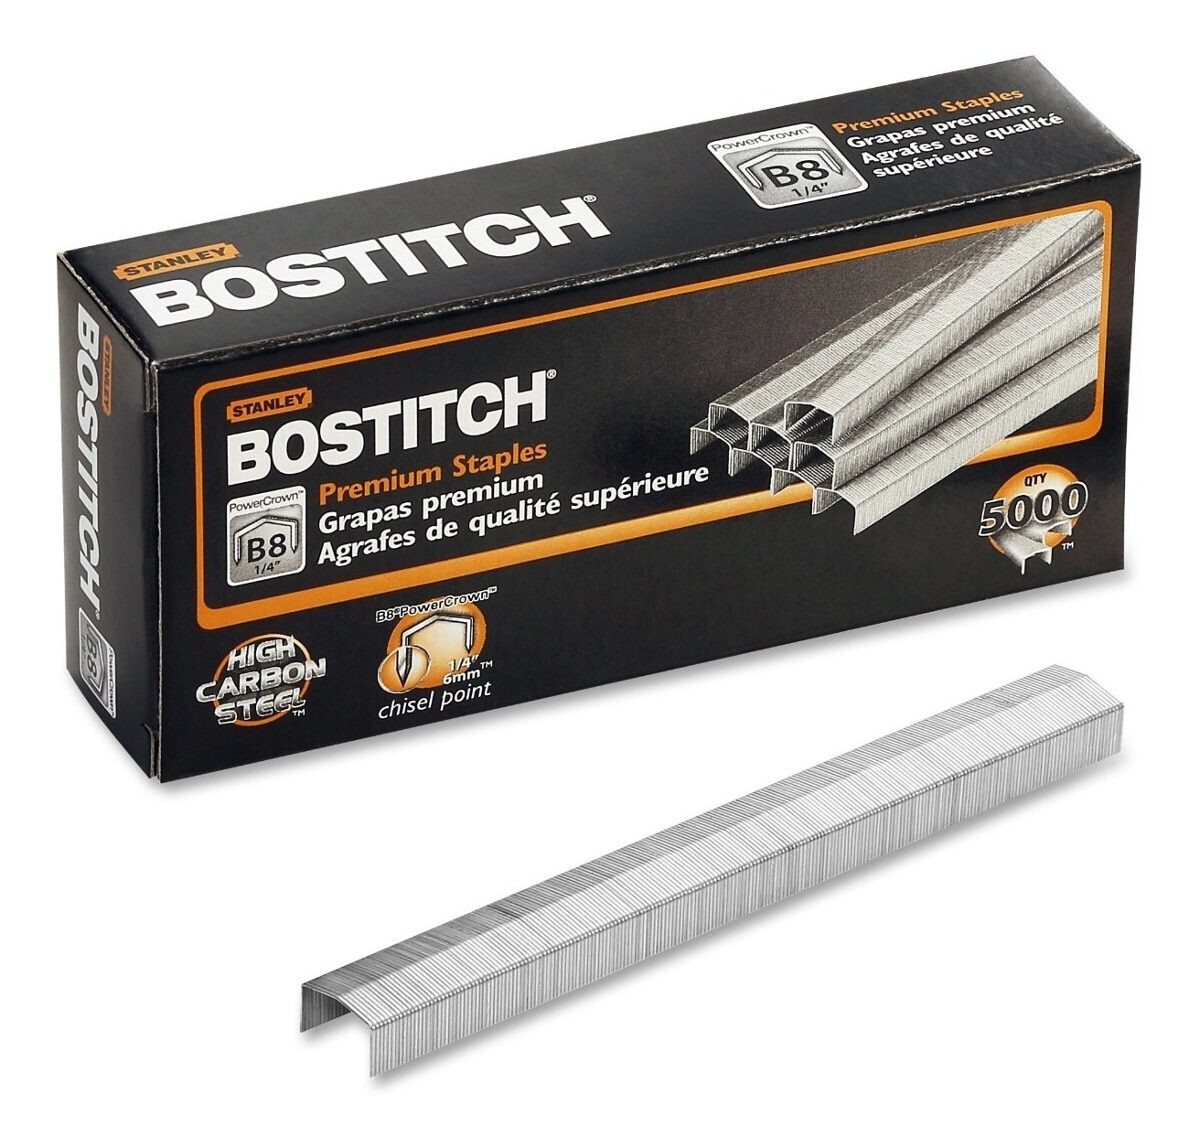 Bostitch / Staples Premium B8, Bx/5000